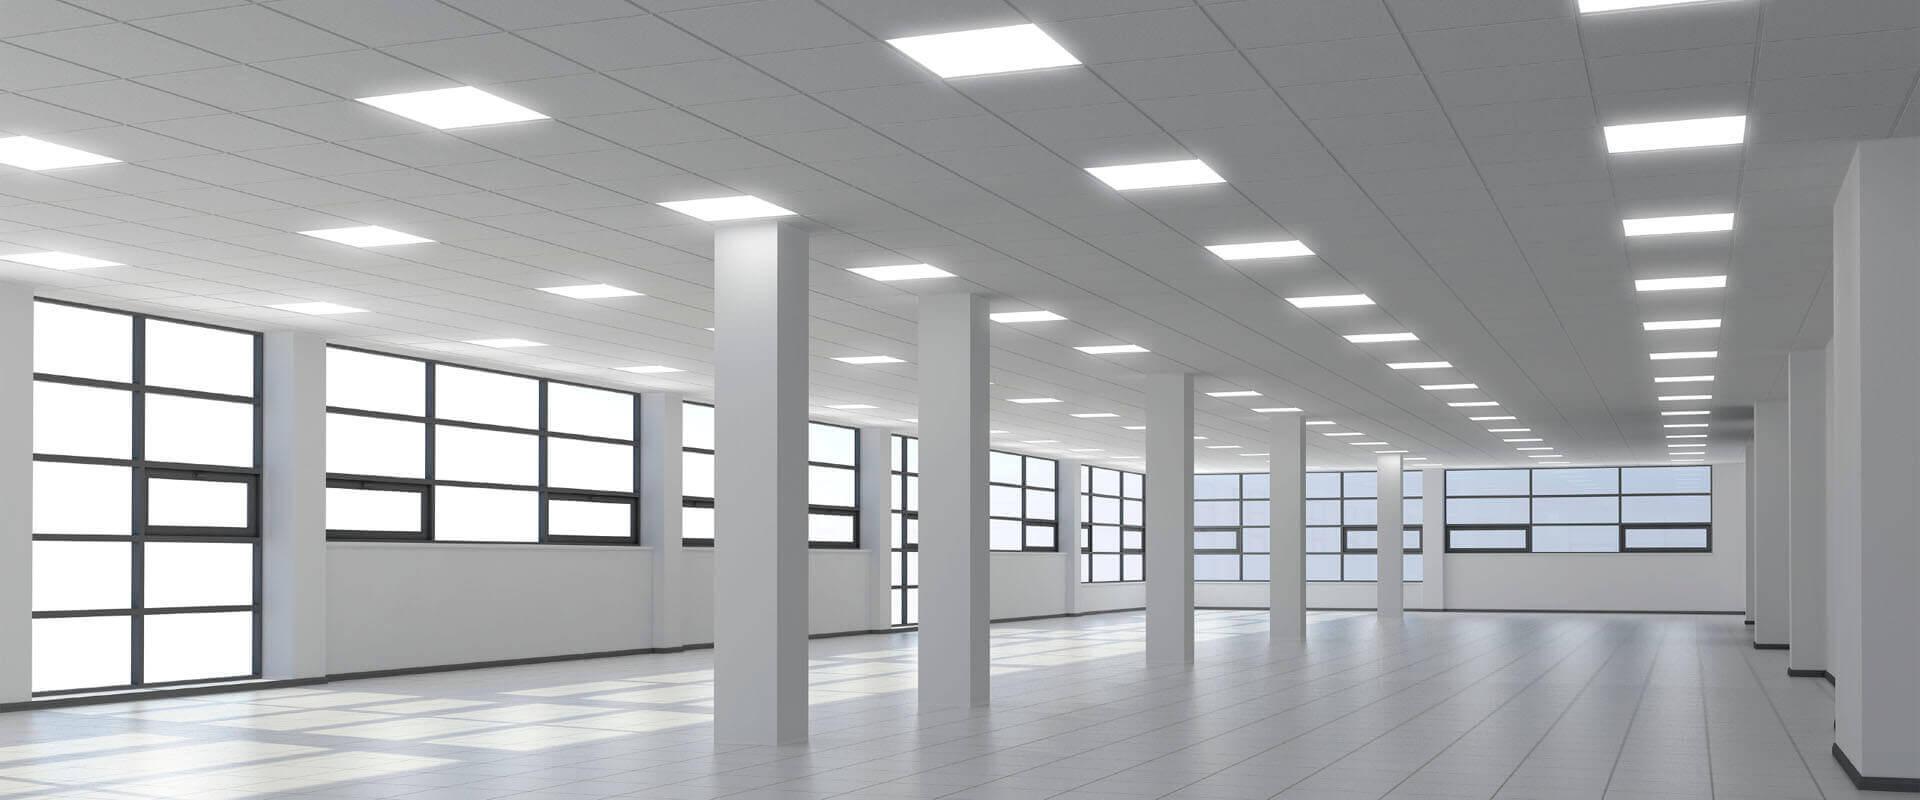 LED lighting services in Basildon